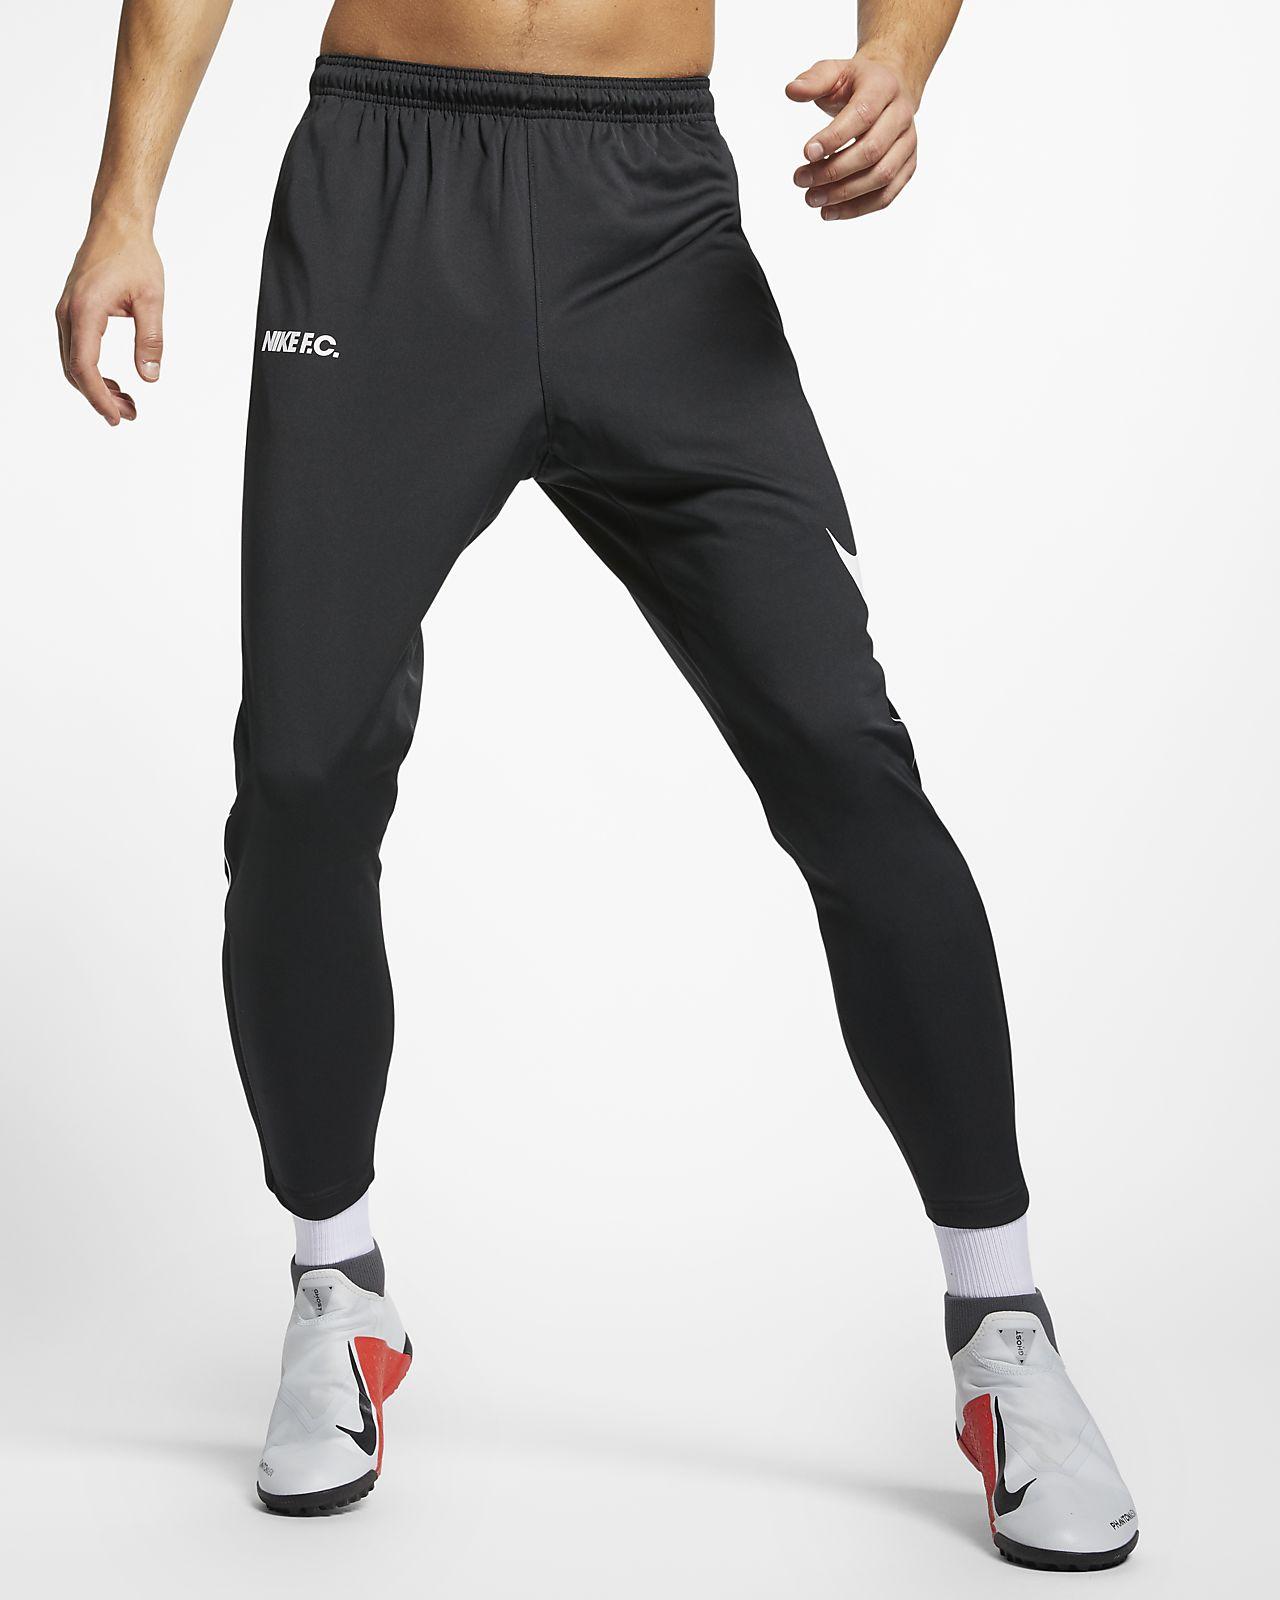 De Nike F cPour Pantalon Homme Football bfmYg7yvI6